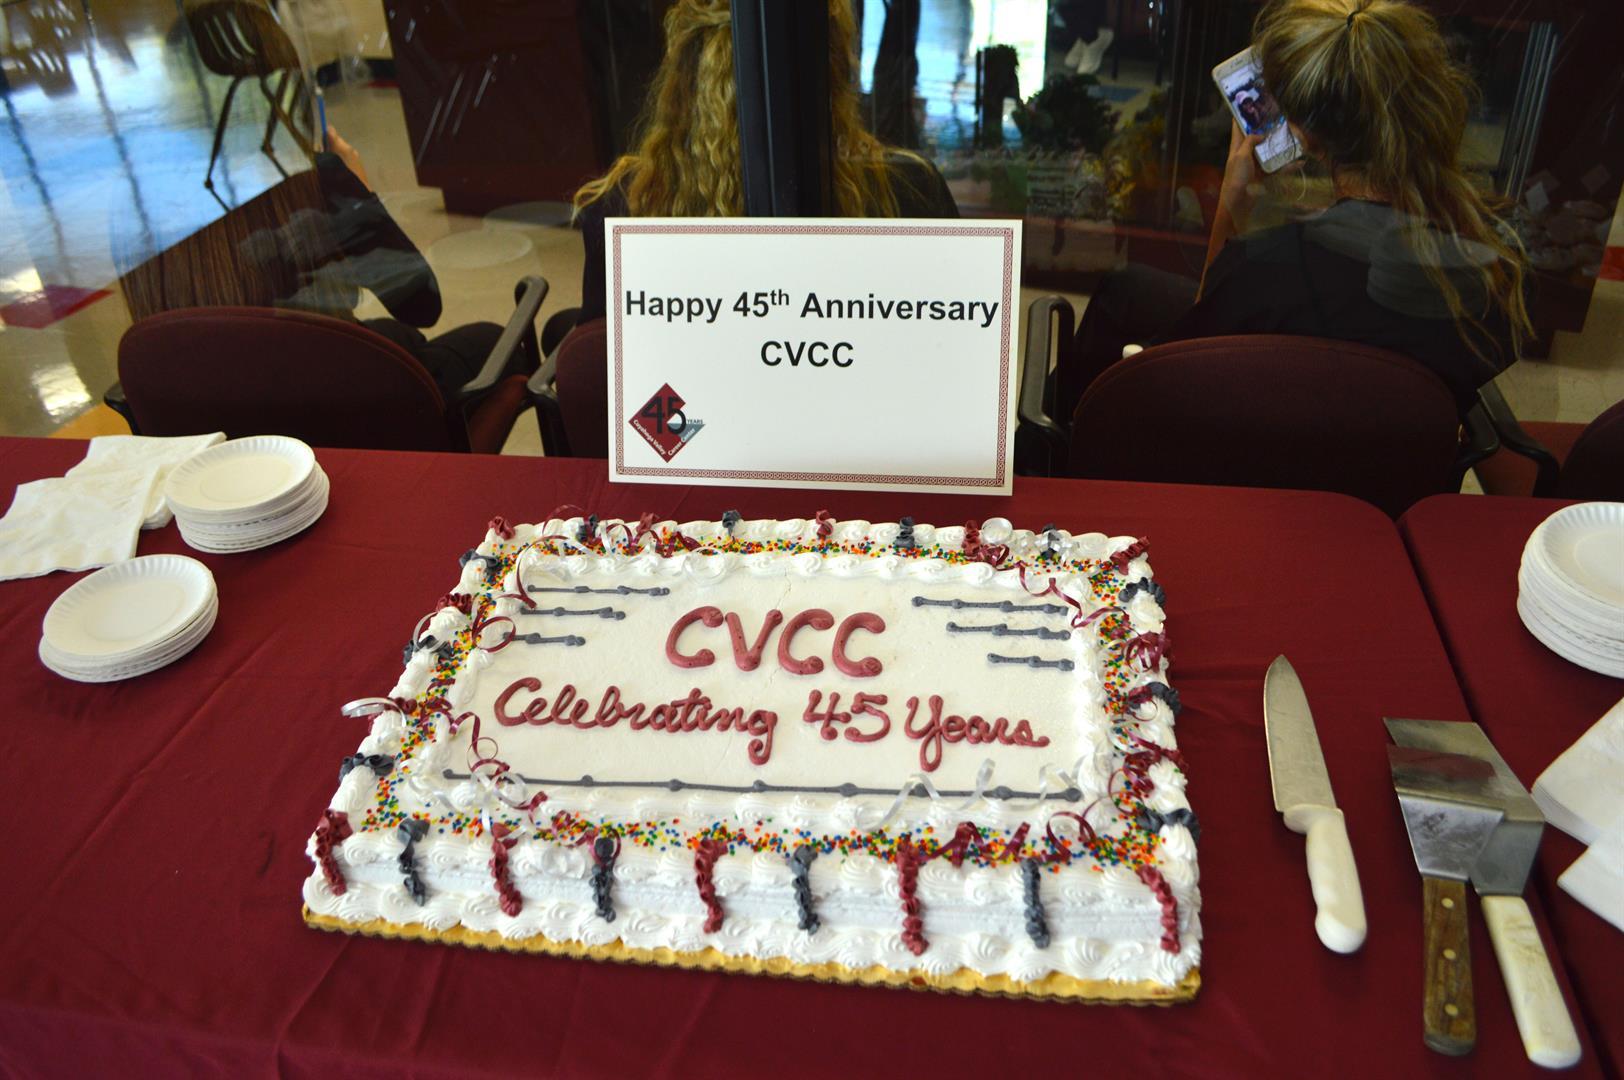 CVCC Celebrates 45 Years